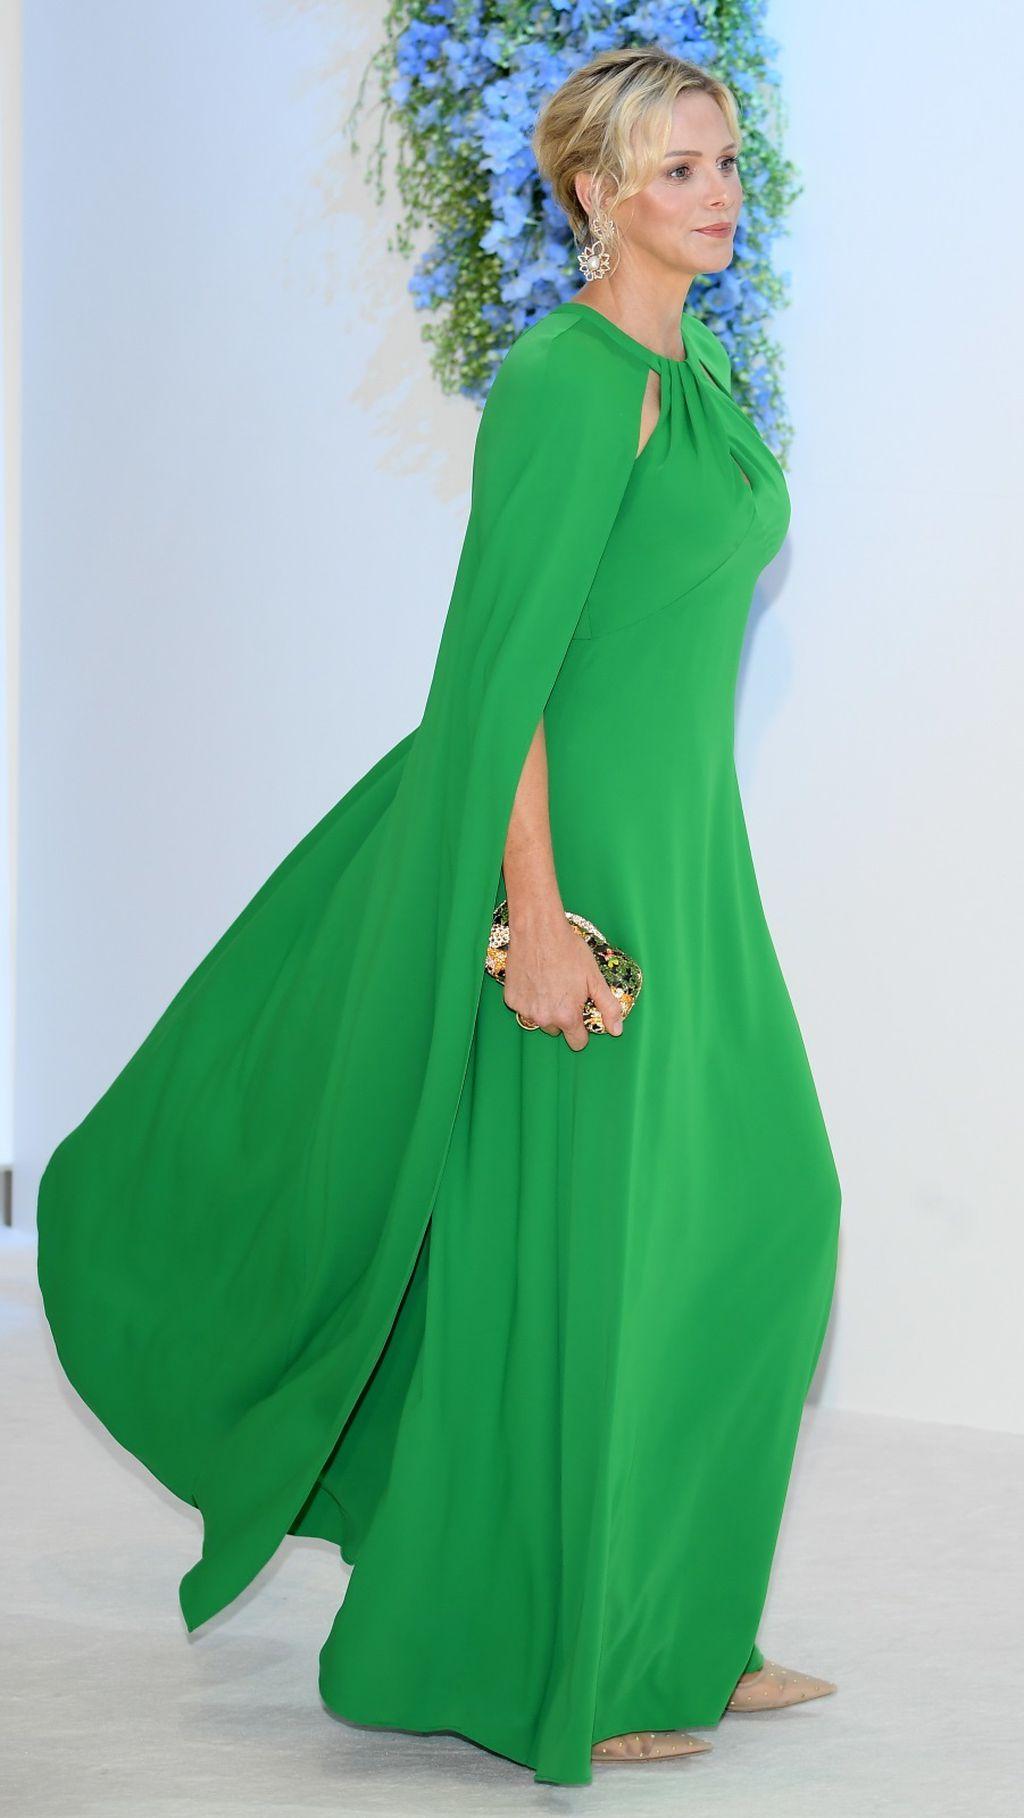 Princeza Charlene od Monaka u haljini za \'božice\' - 4